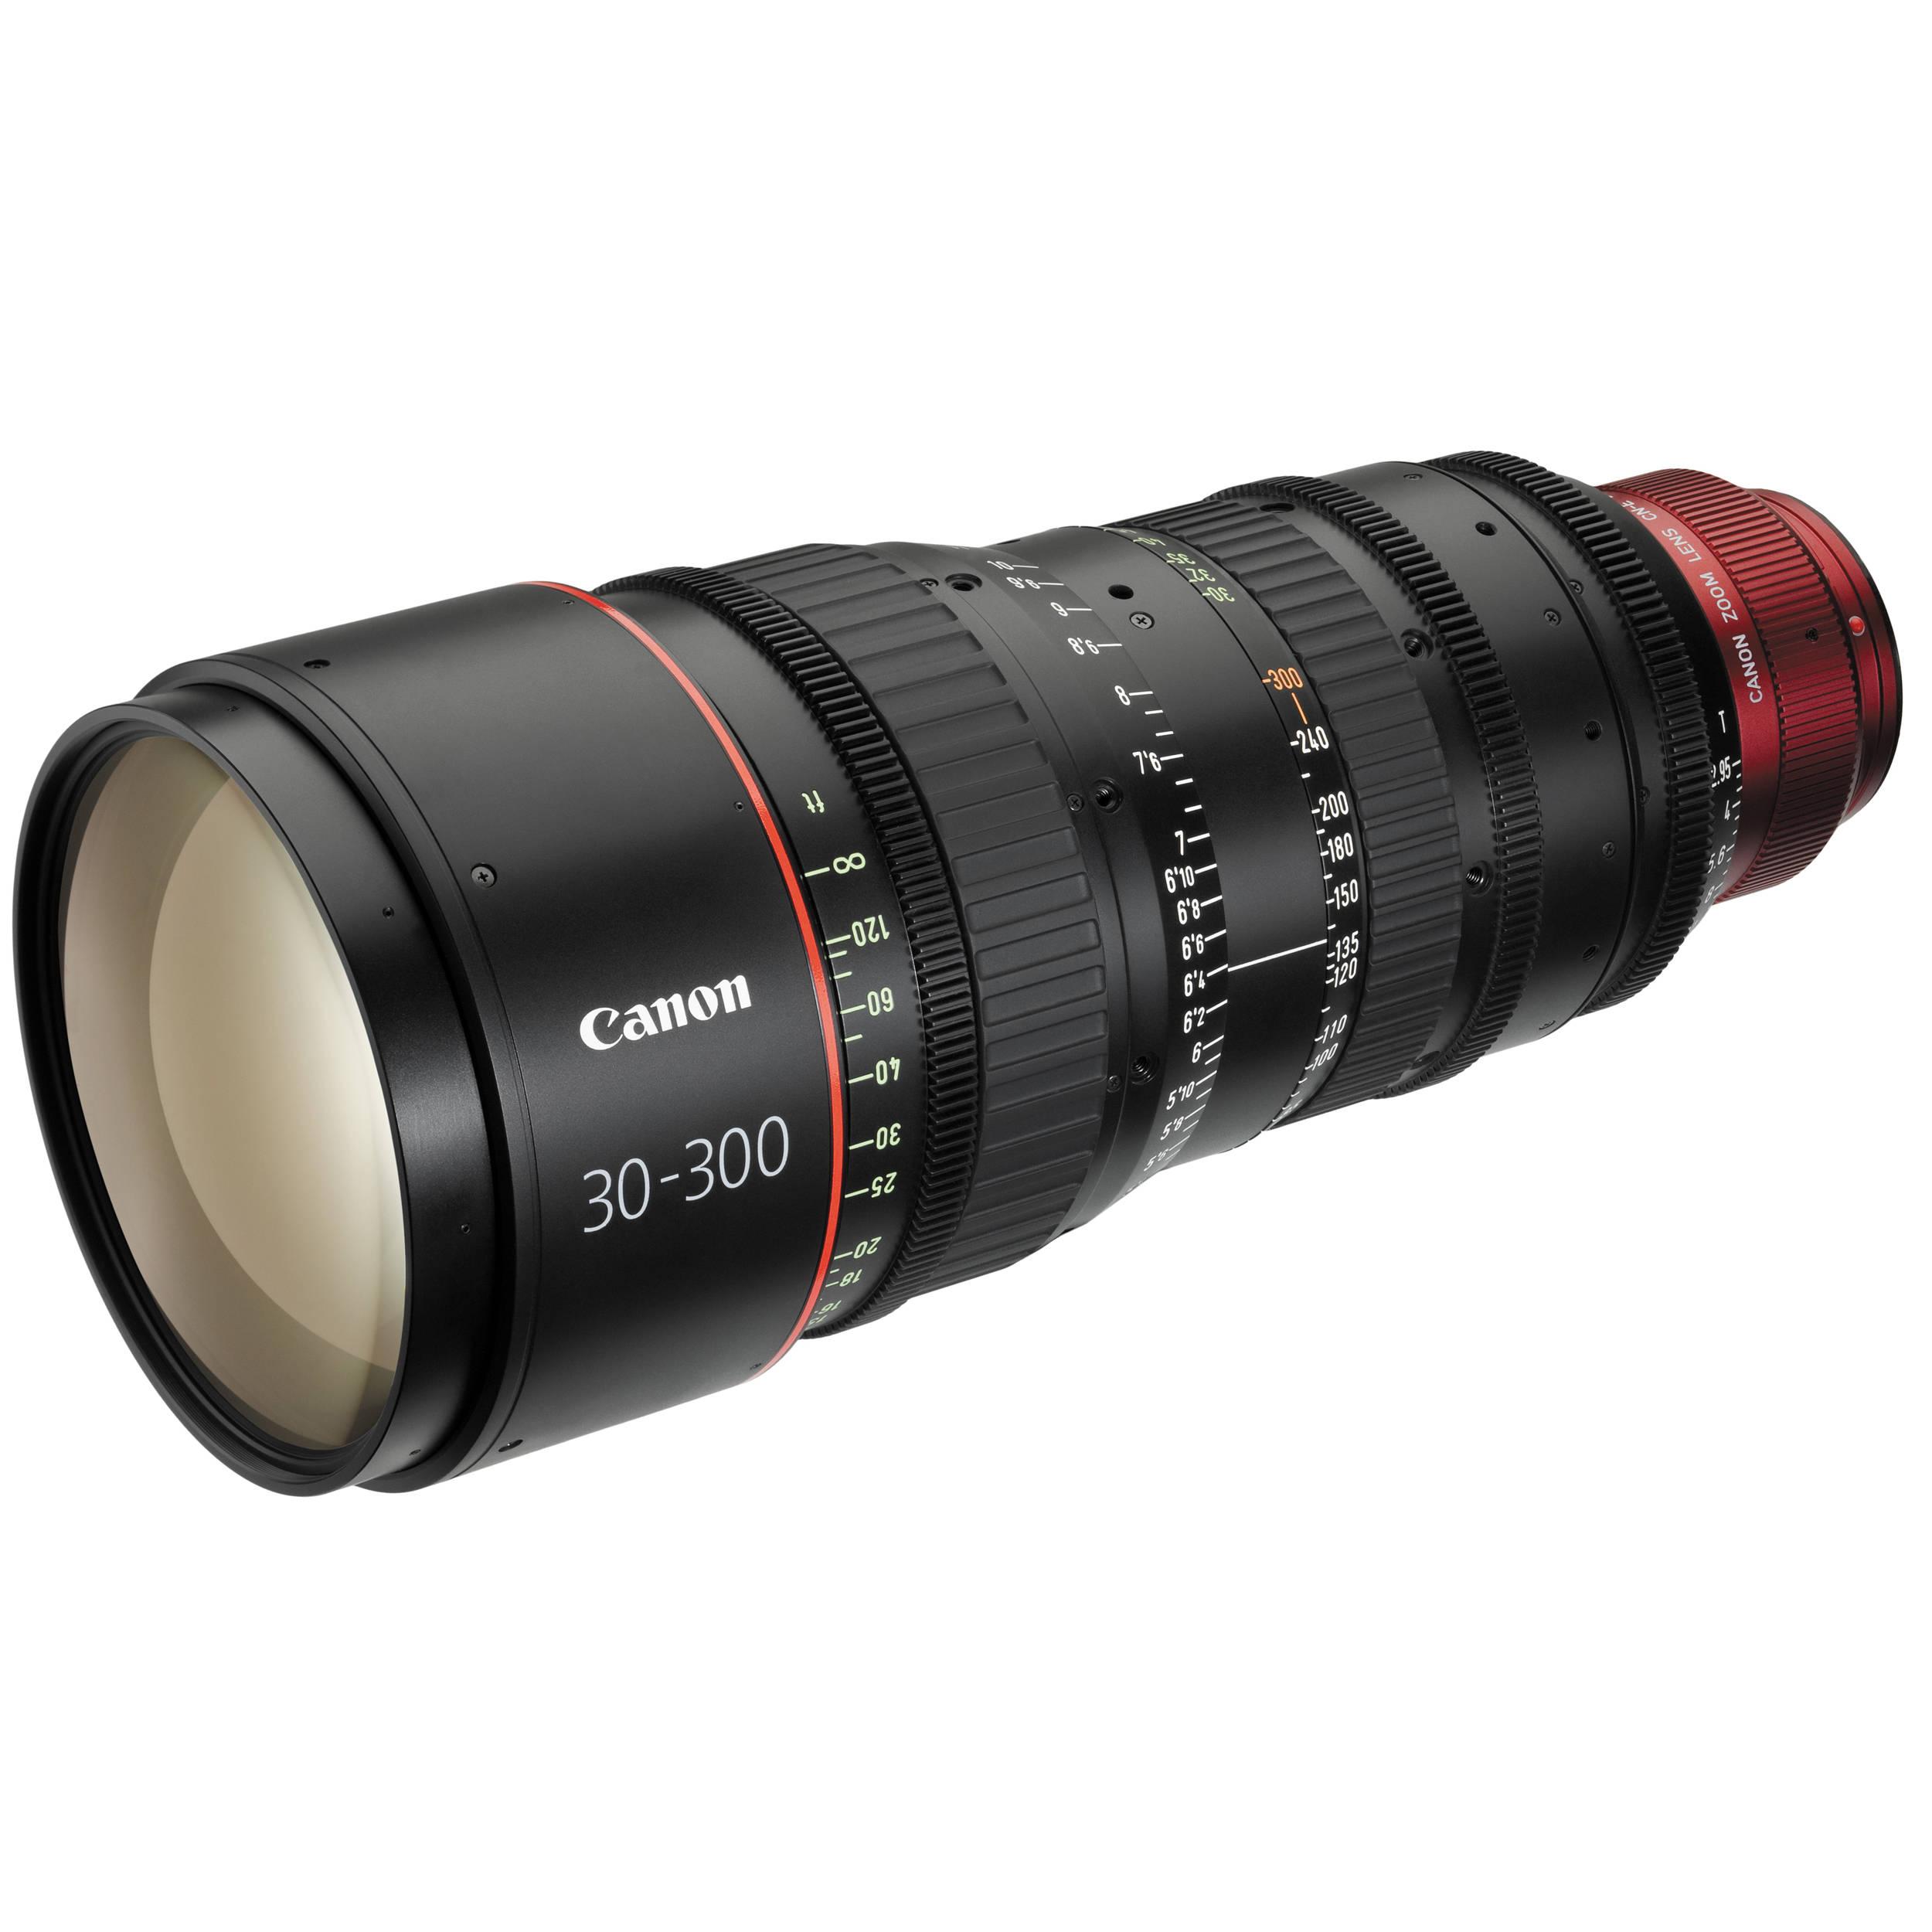 Canon_30-300mm_CINEMA_ZOOM.jpg